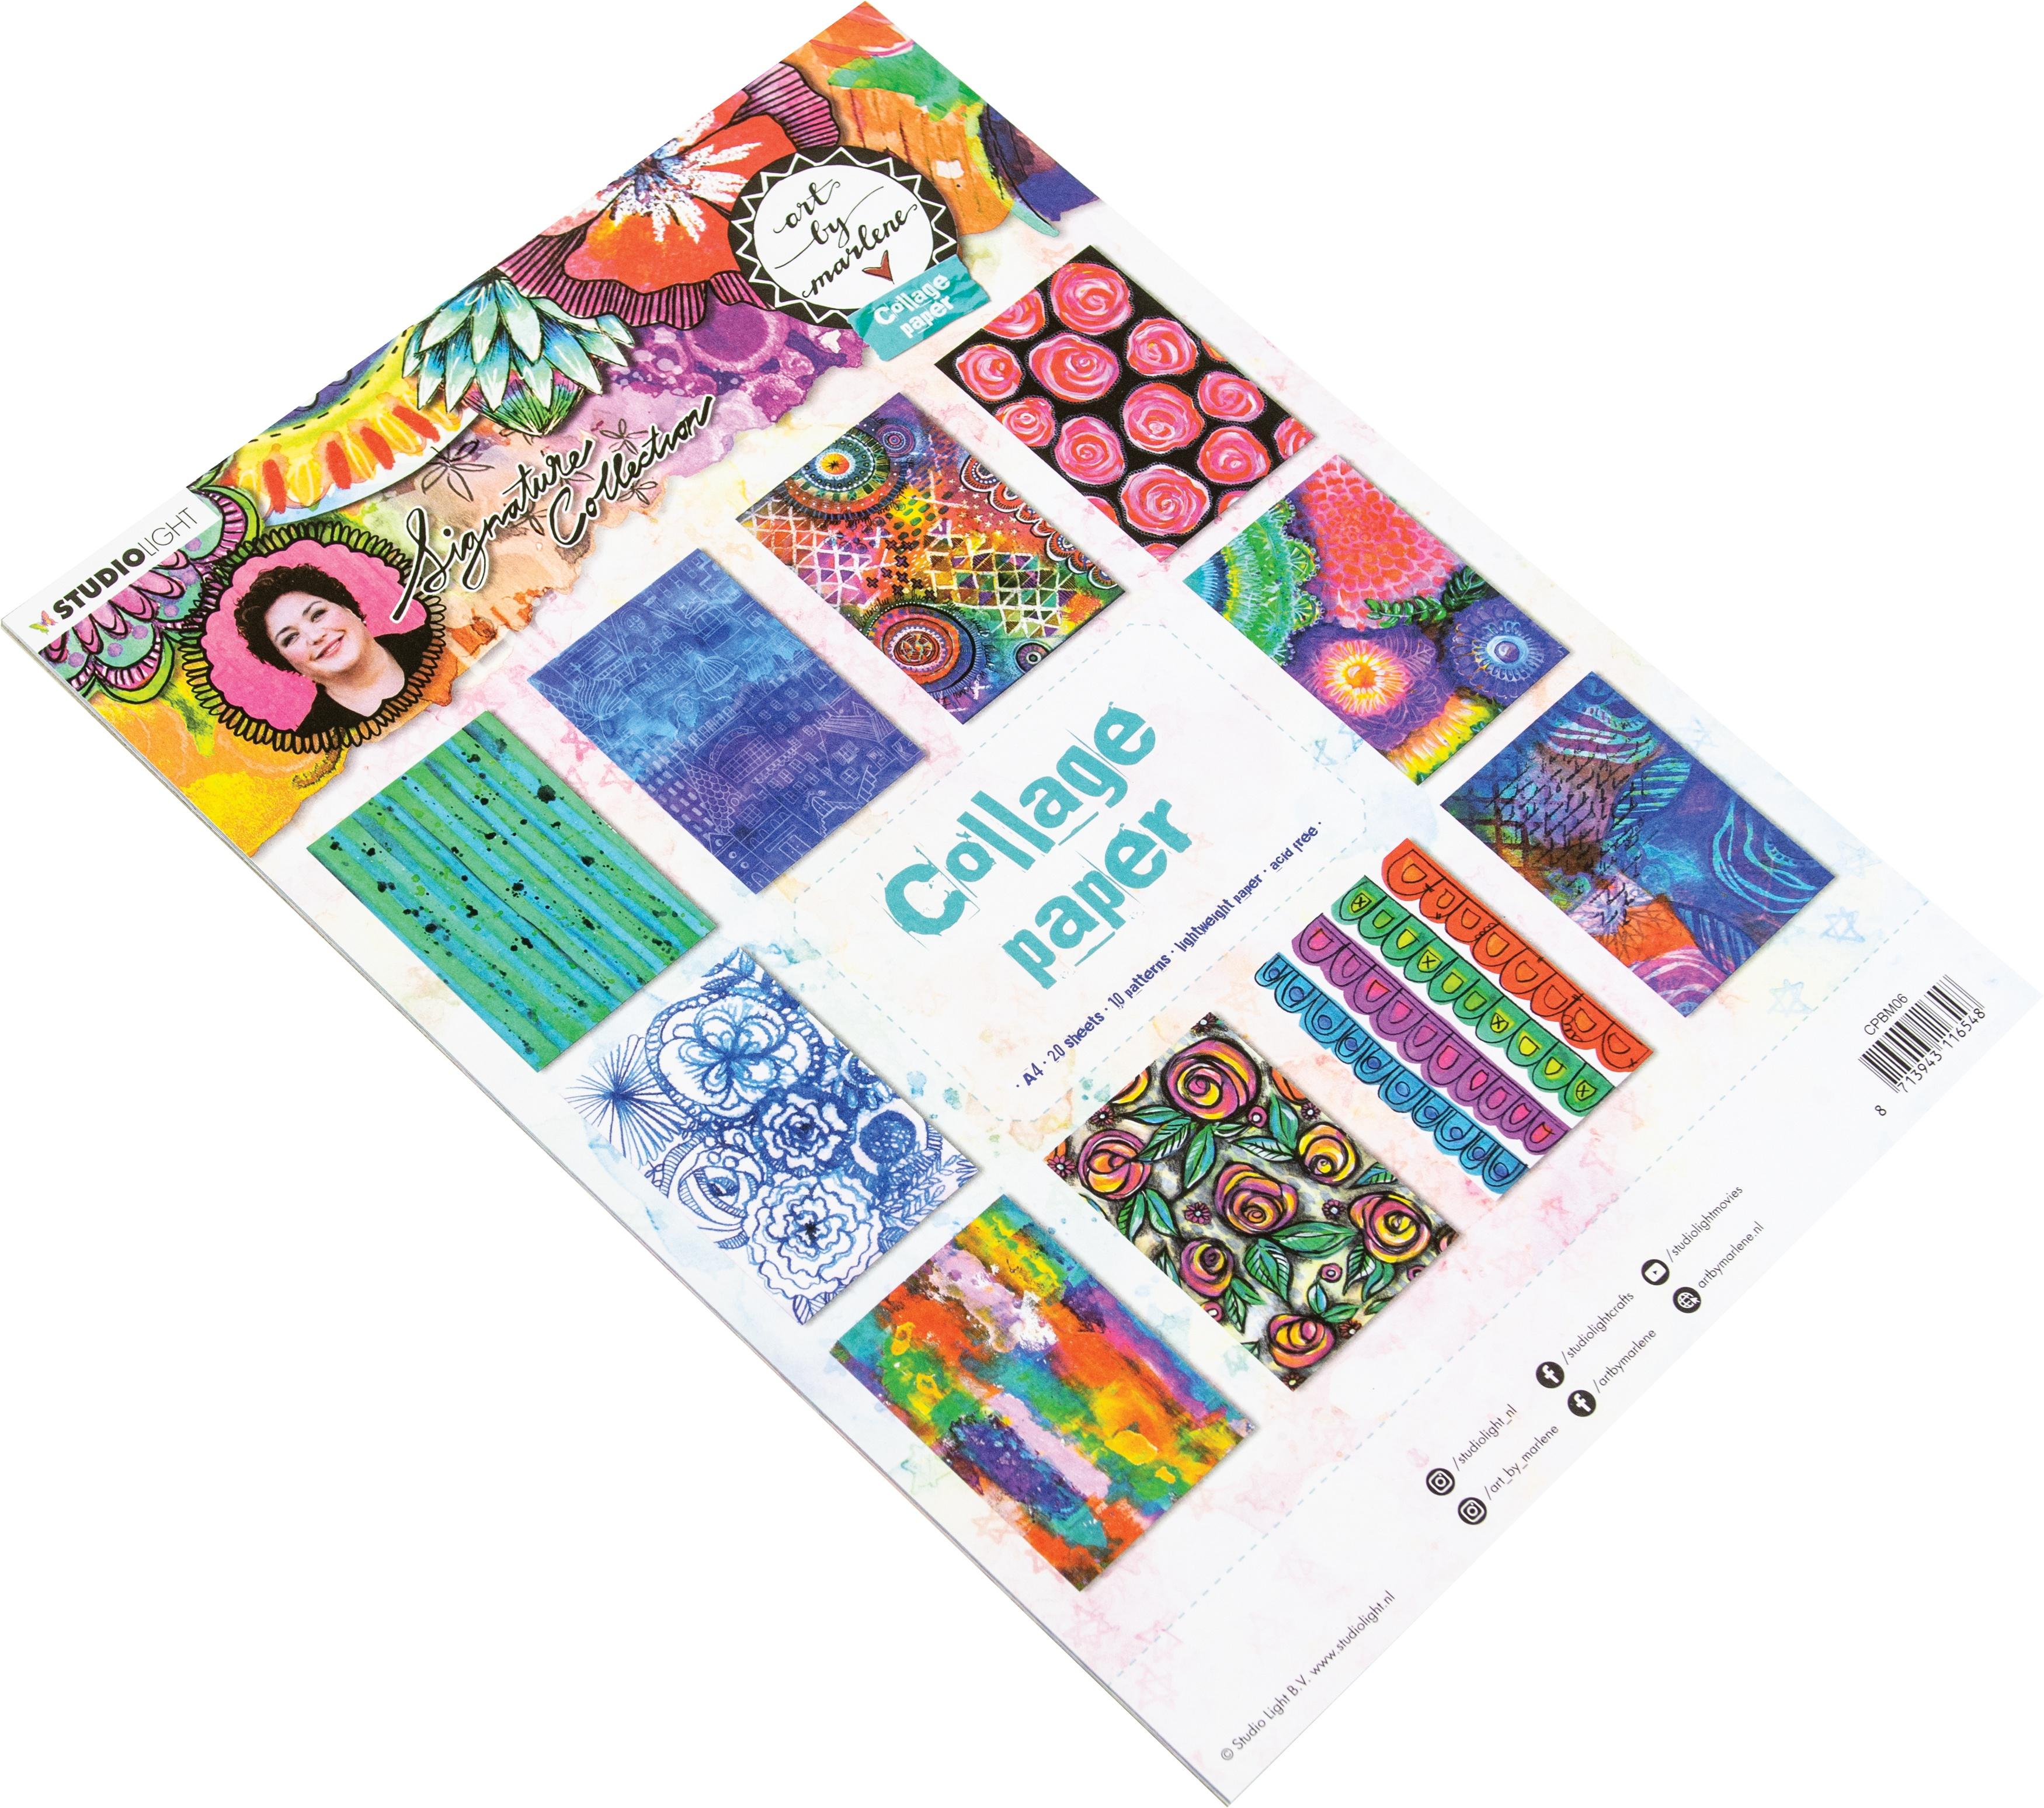 Art By Marlene - 5.0 Collage Paper A4 20/Pkg-NR. 06, 10 Designs/2 Each